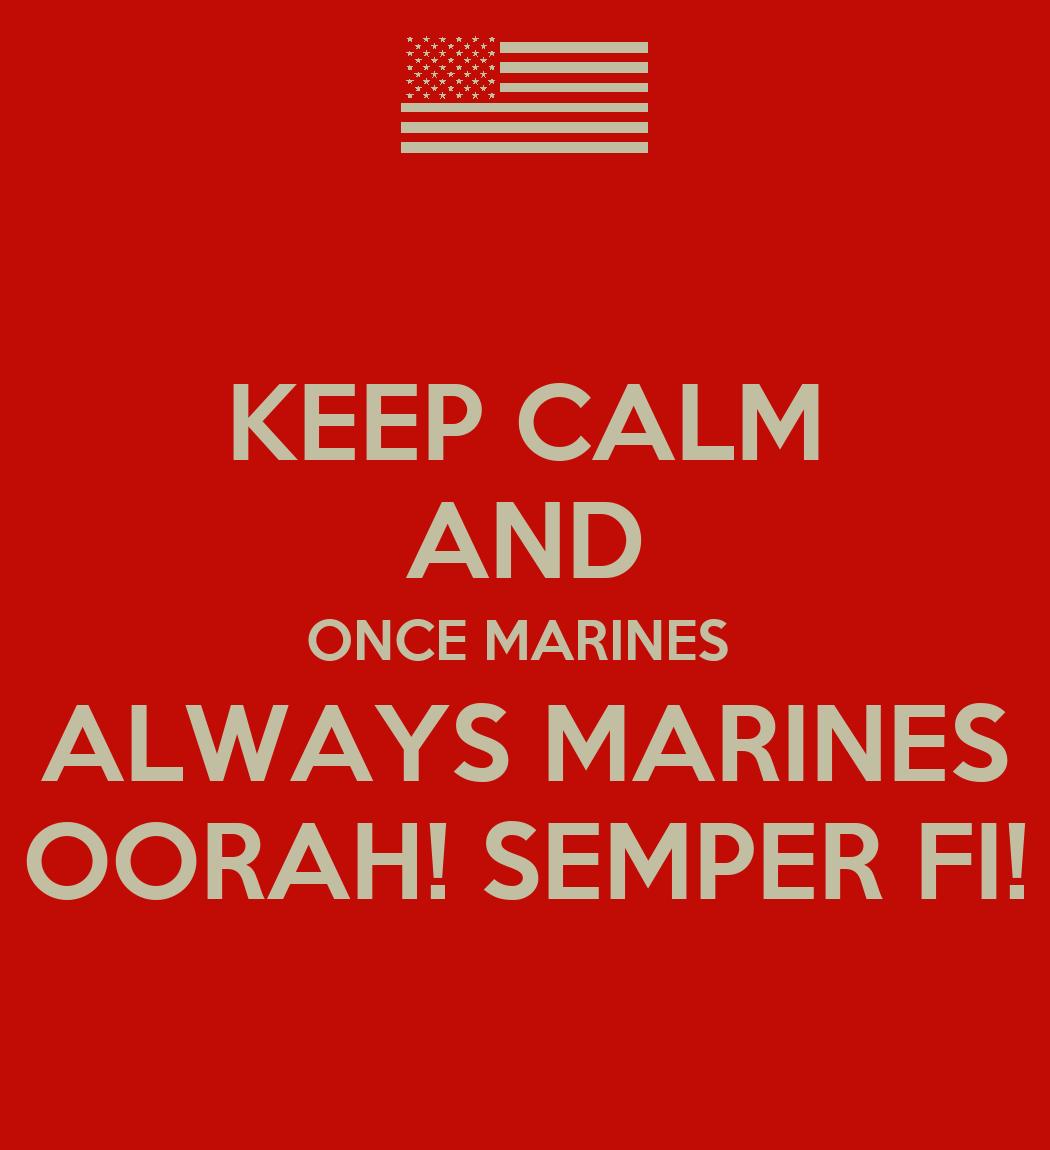 KEEP CALM AND ONCE MARINES ALWAYS MARINES OORAH! SEMPER FI ...